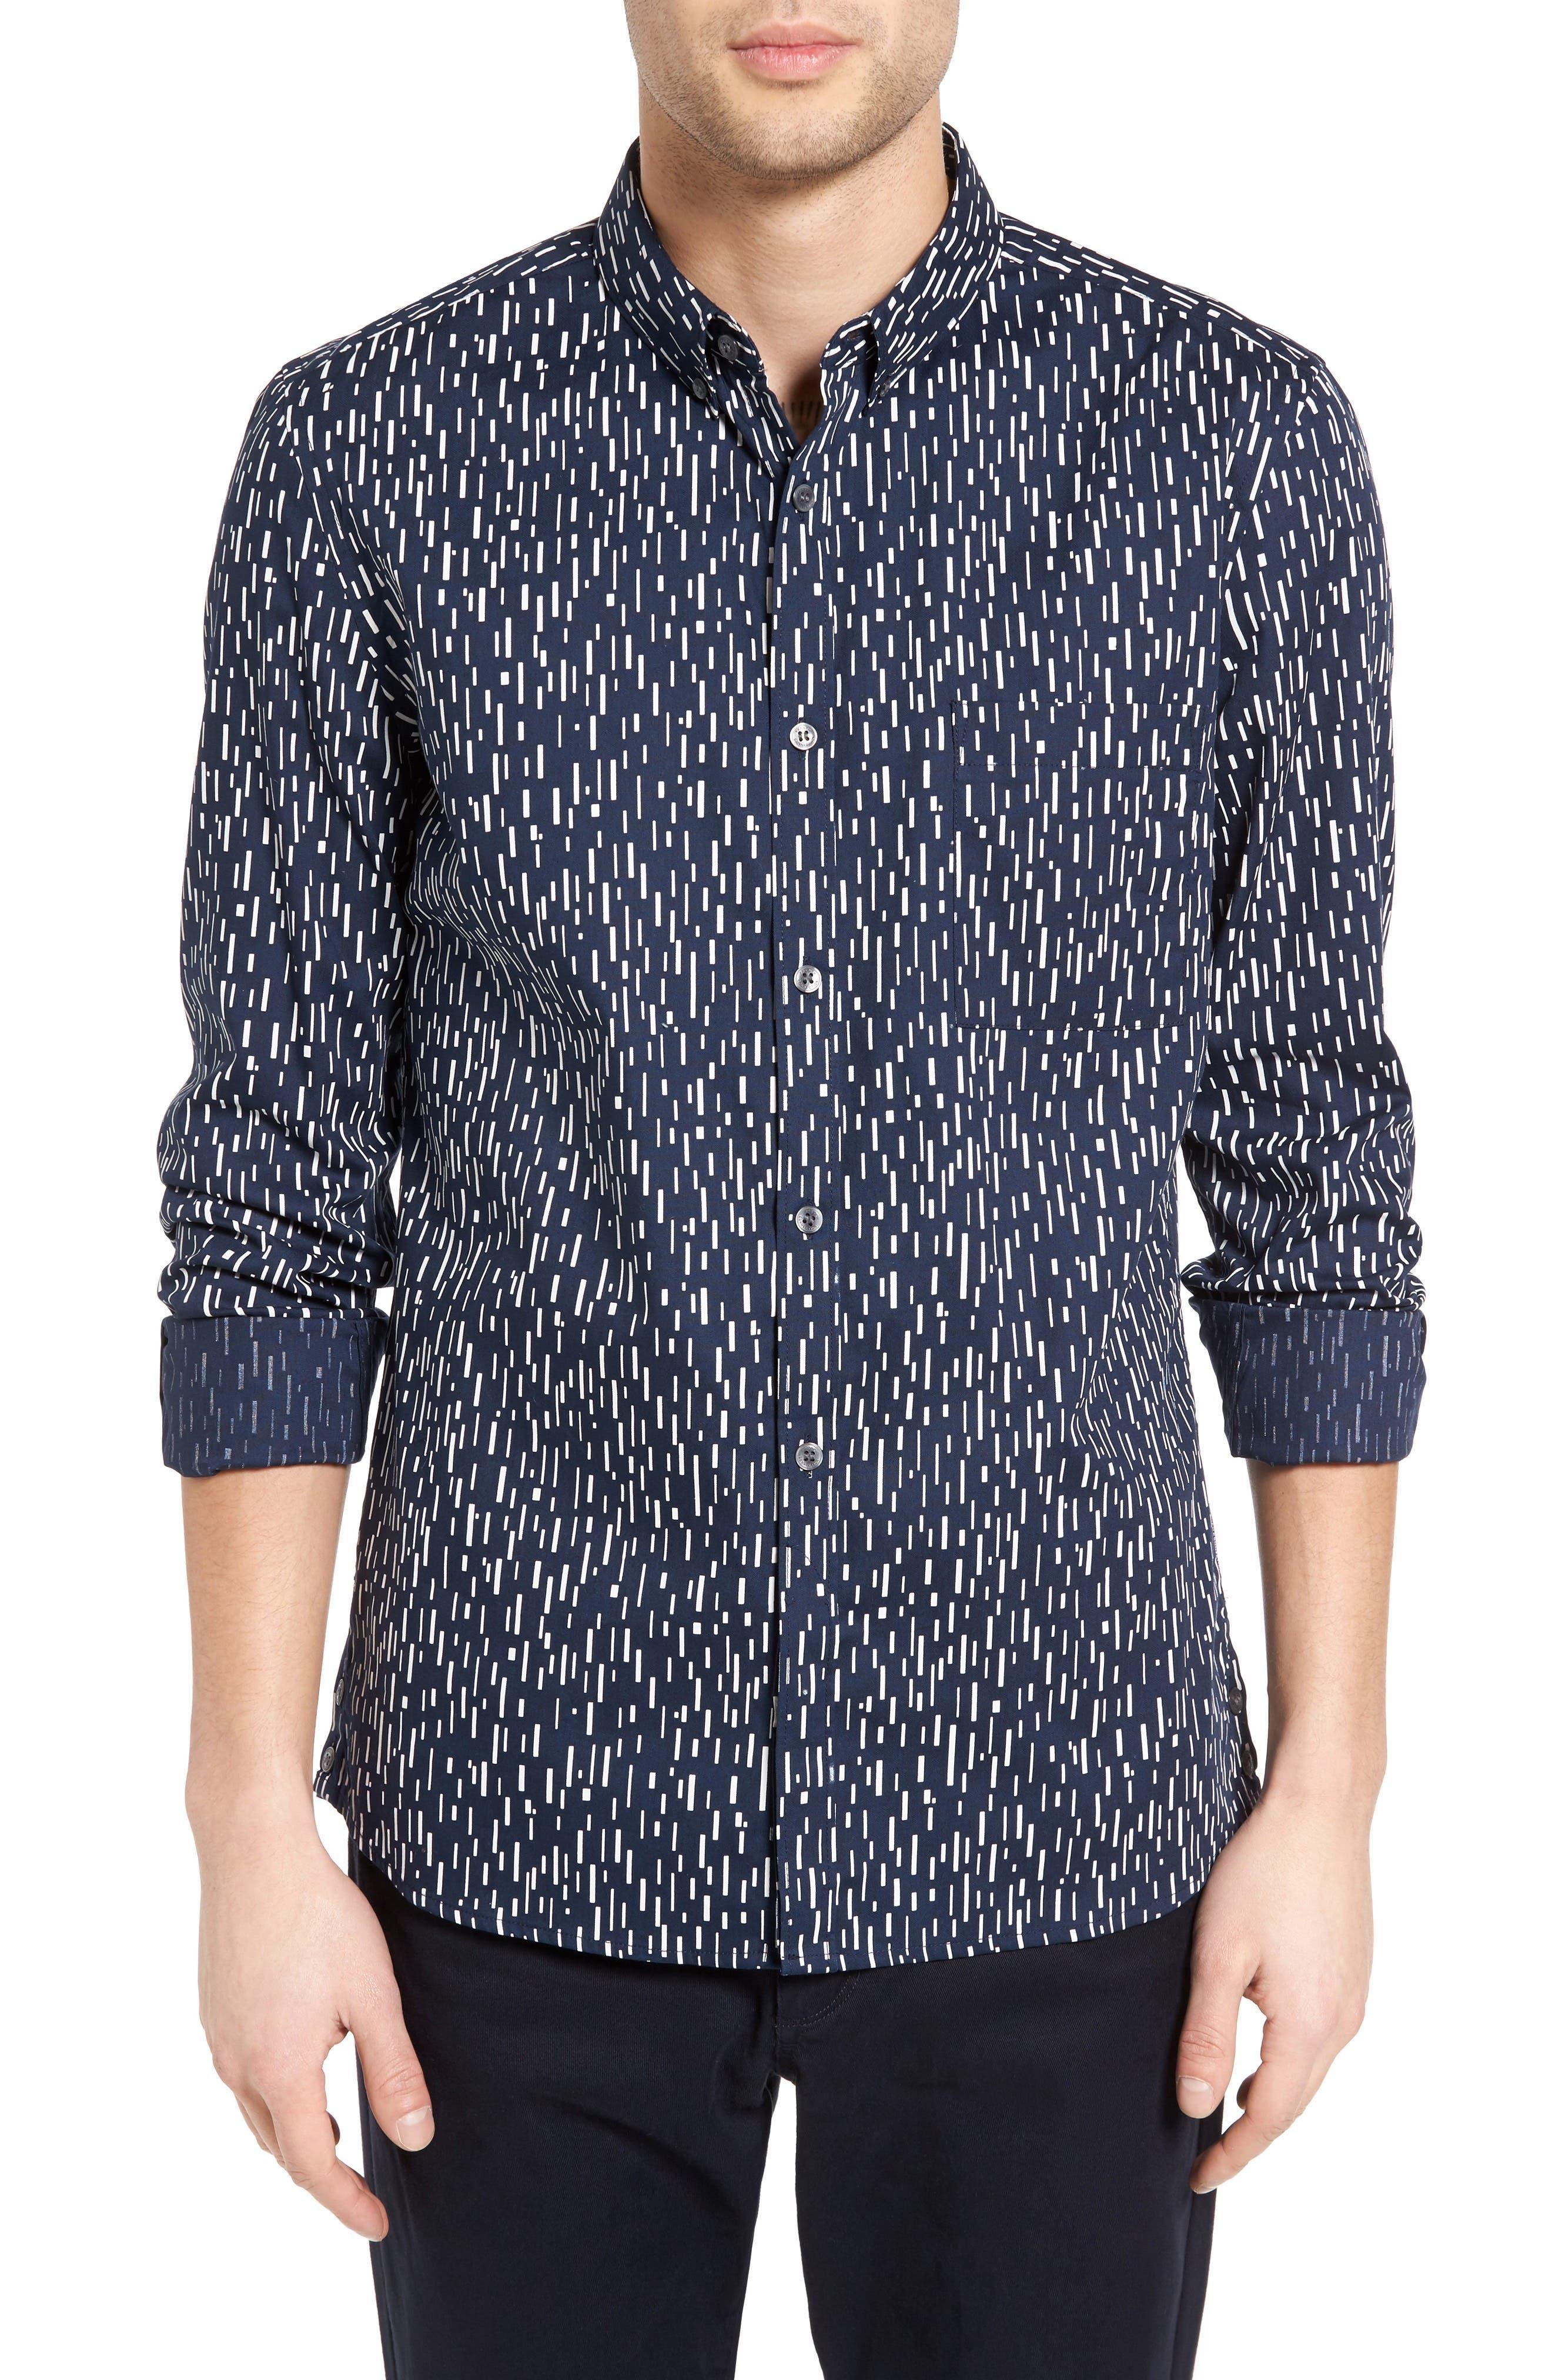 Rain Dash Slim Fit Oxford Shirt,                             Main thumbnail 1, color,                             407